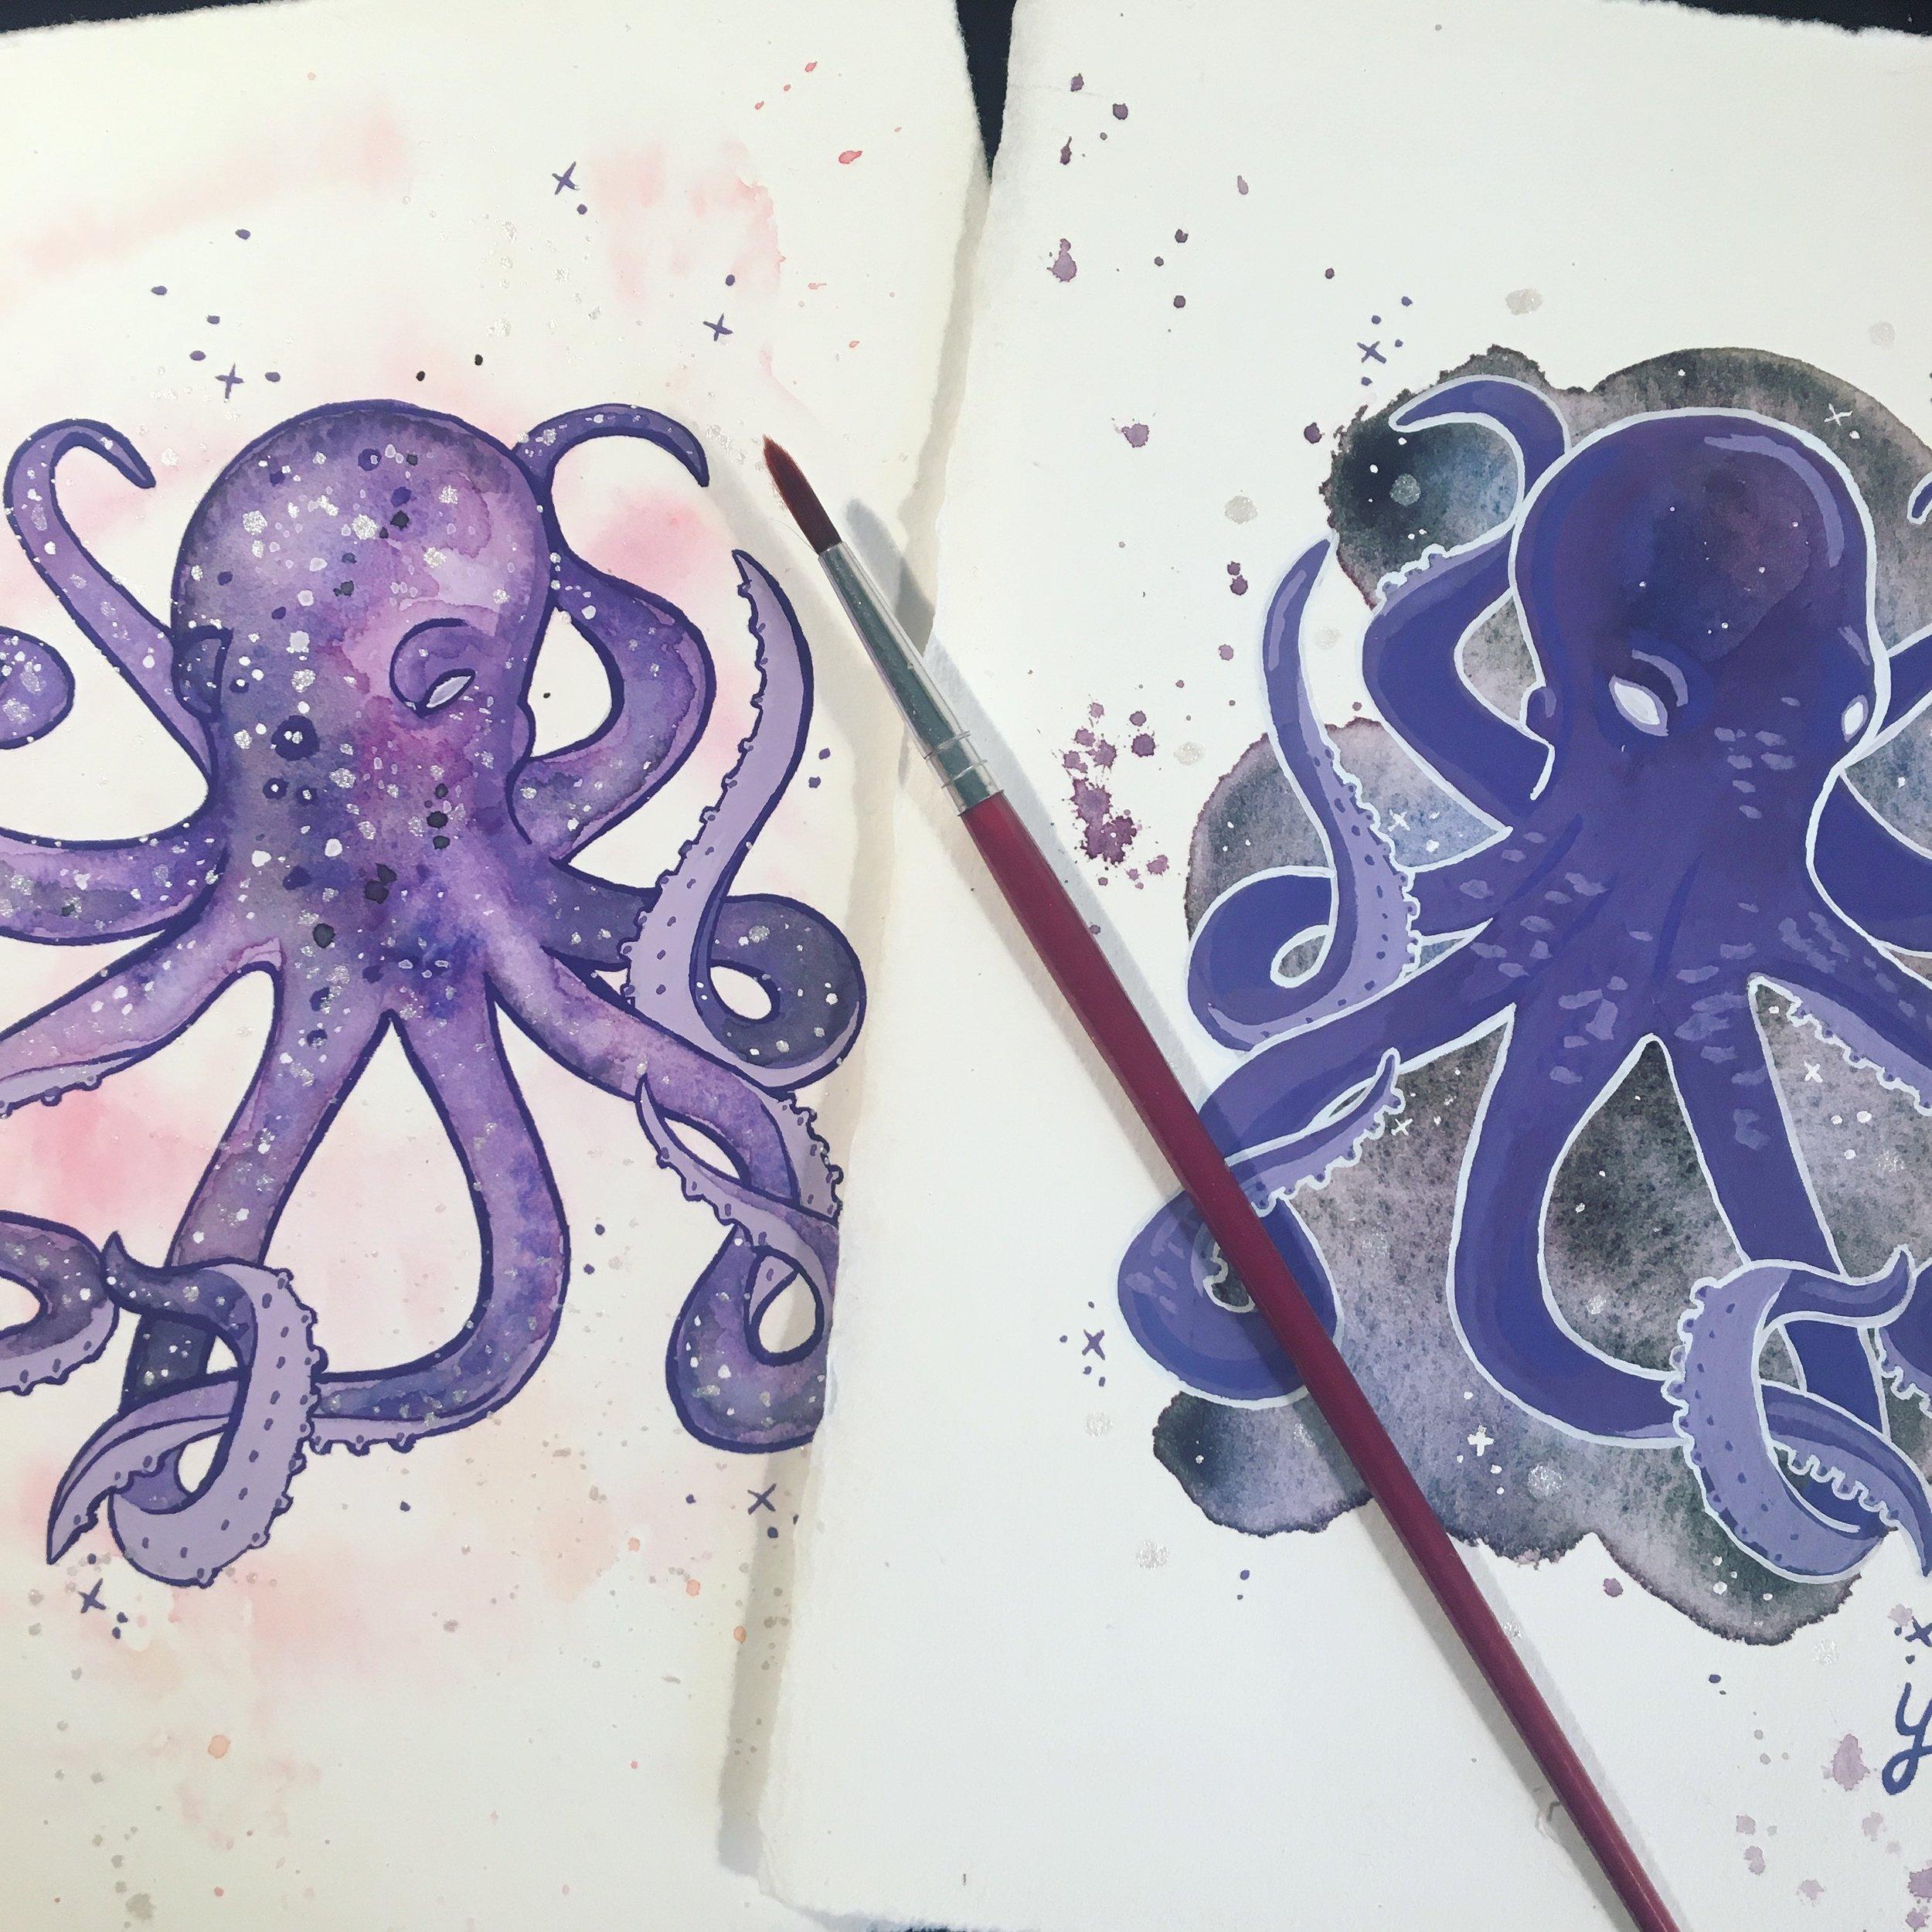 Galactic Octopus 1 & 2